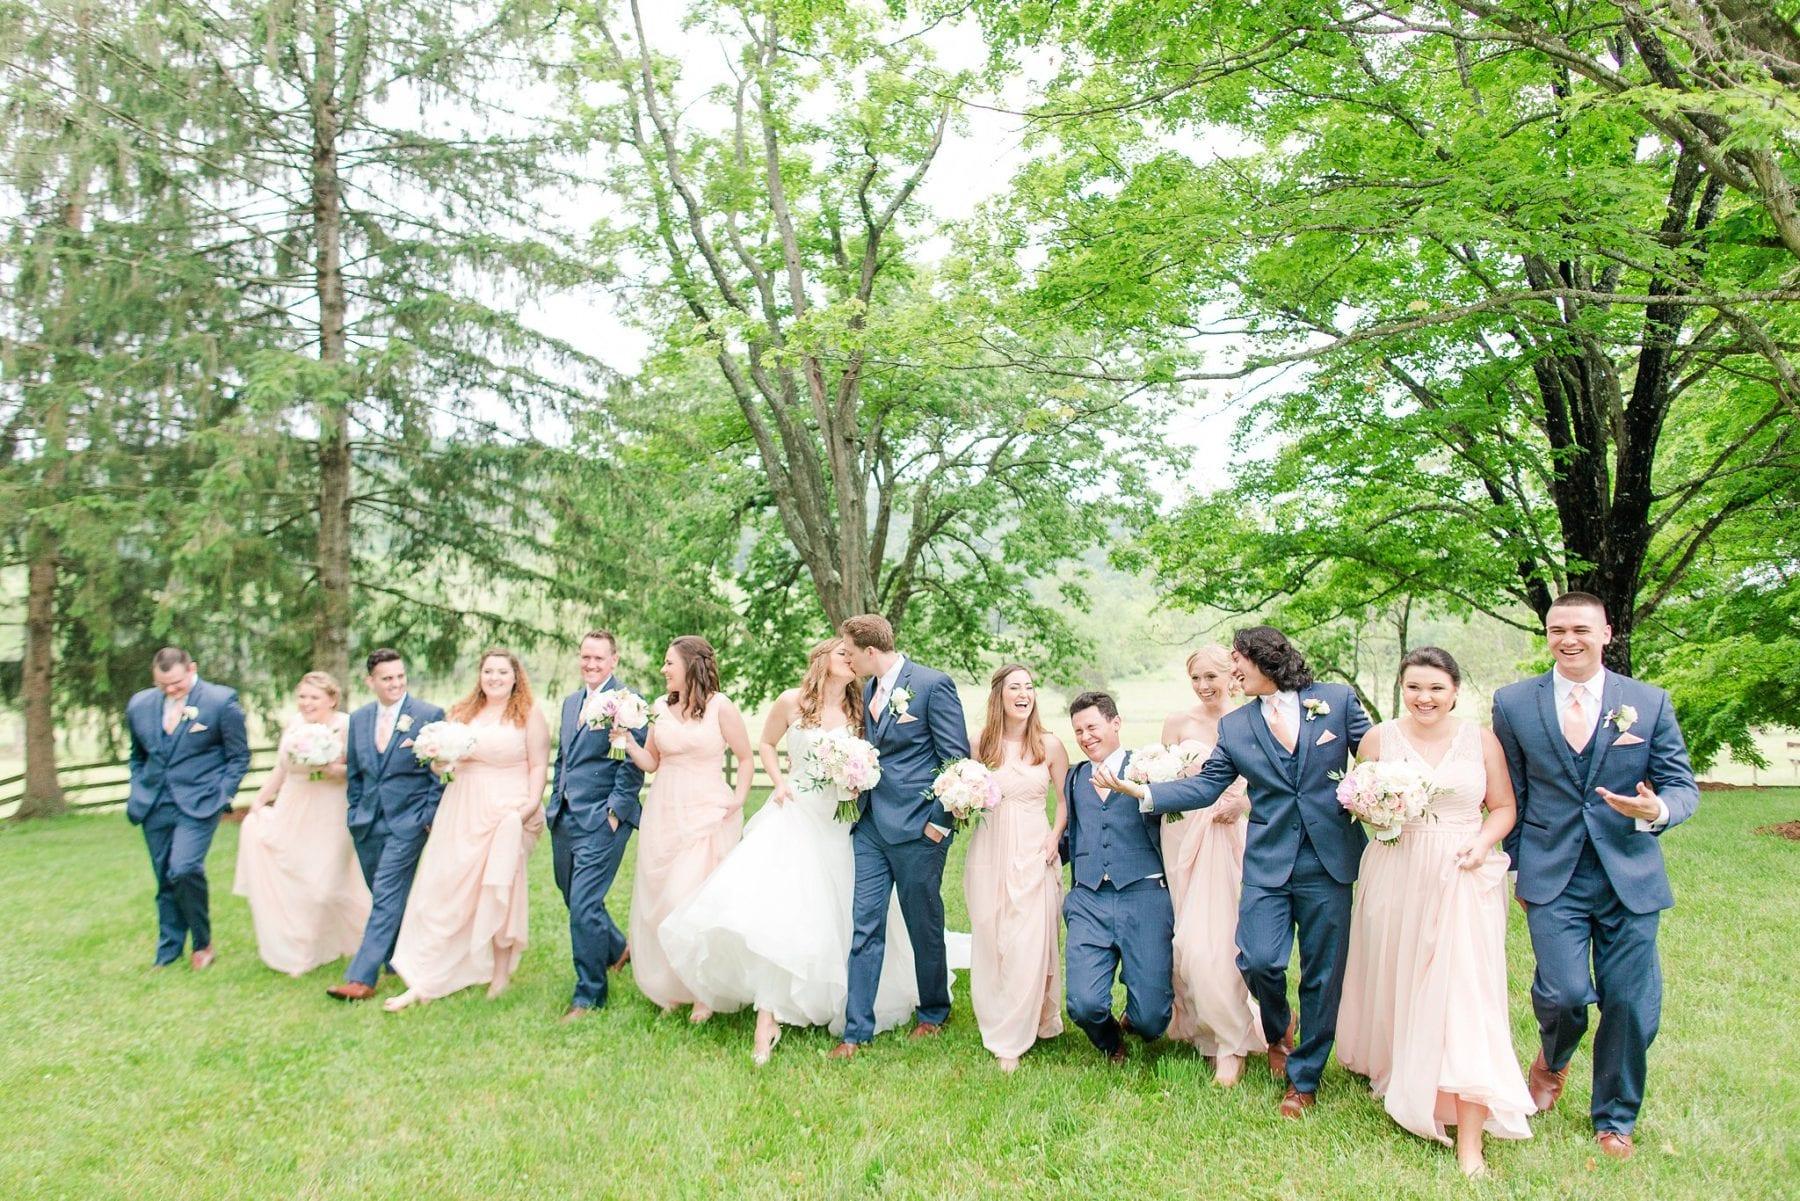 Justin & Megan Big Spring Farm Wedding Photos-144.jpg